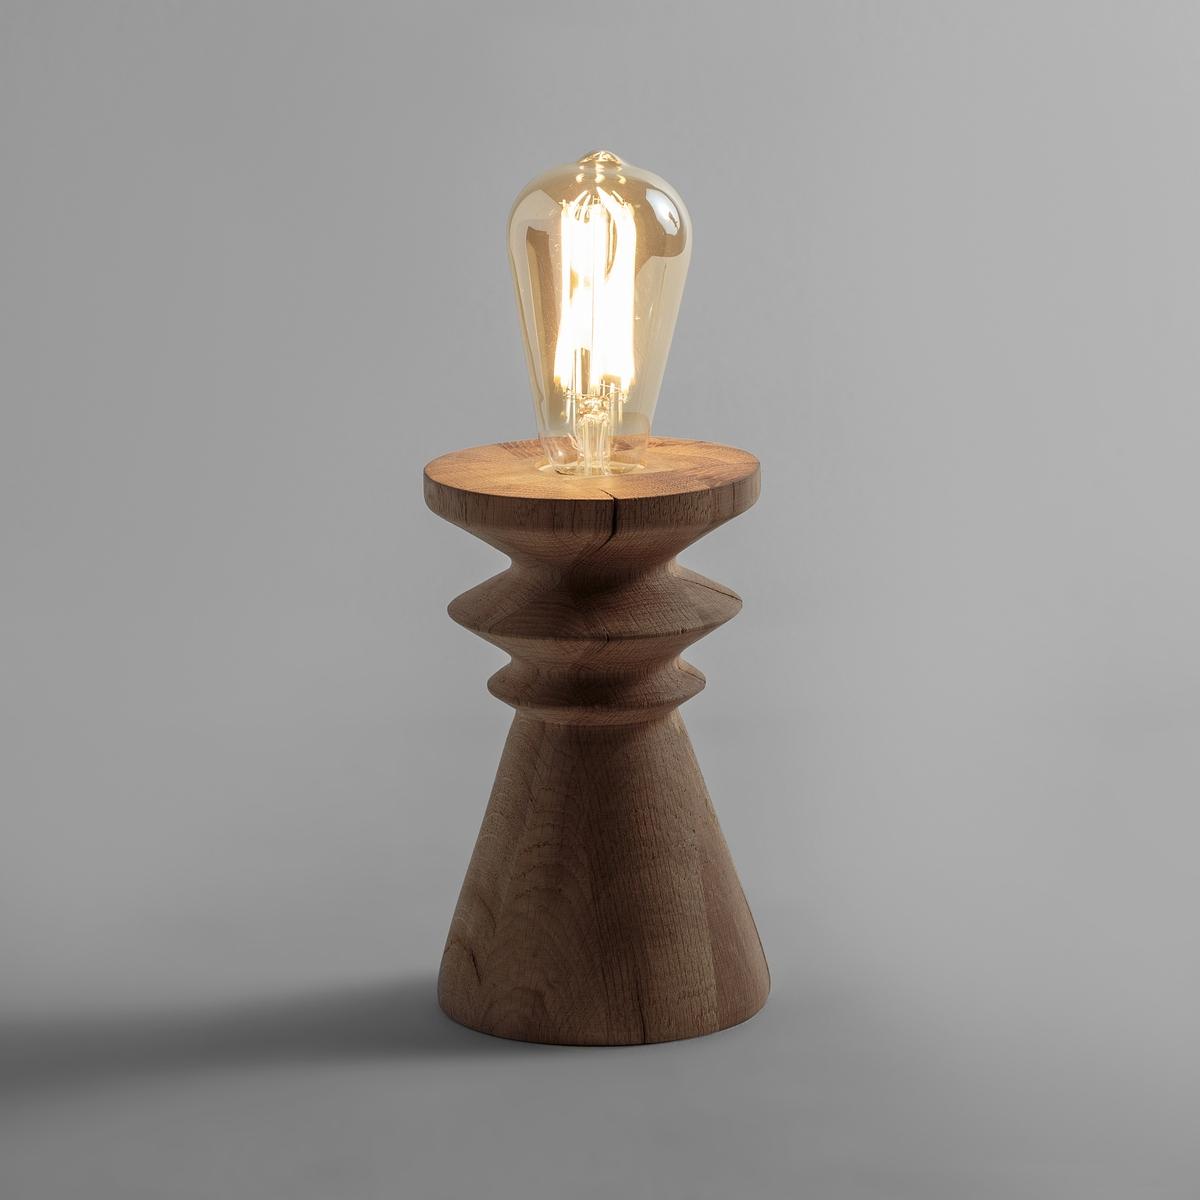 Lampada LED decorativa attacco grosso Ø6,4xA14,2 cm